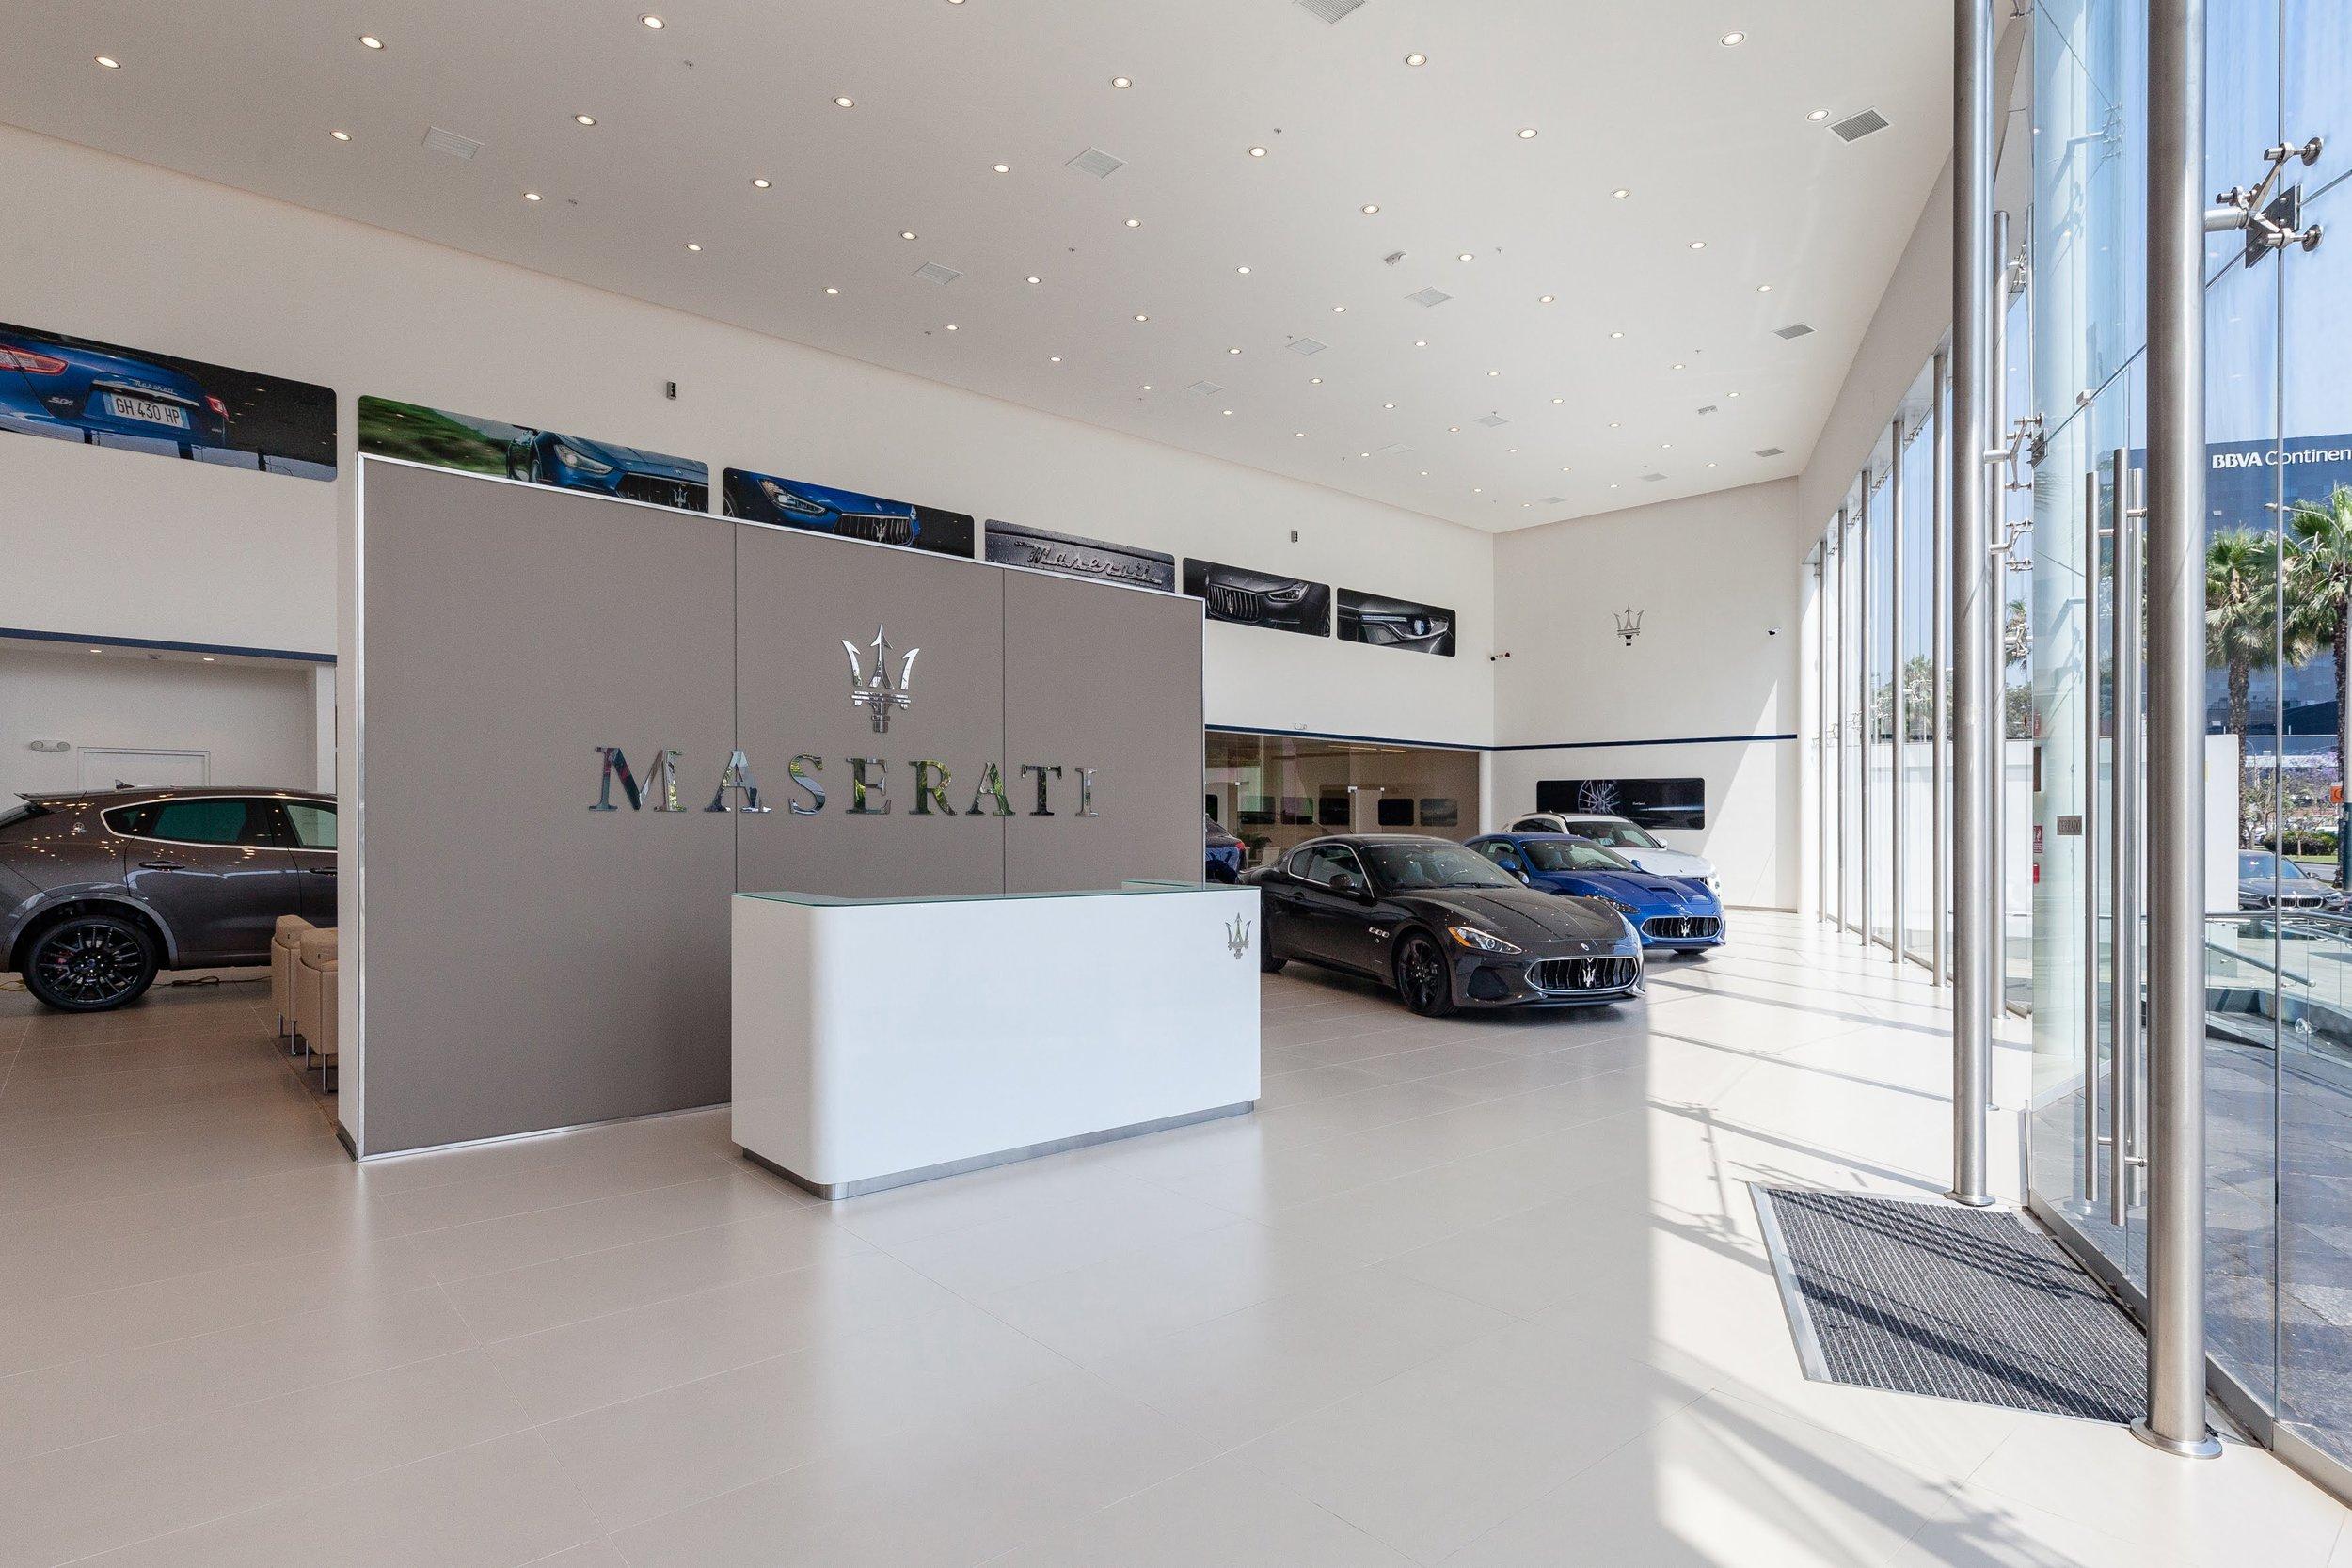 20181219-DRRP-PE-Fotos-Maserati-015.jpg